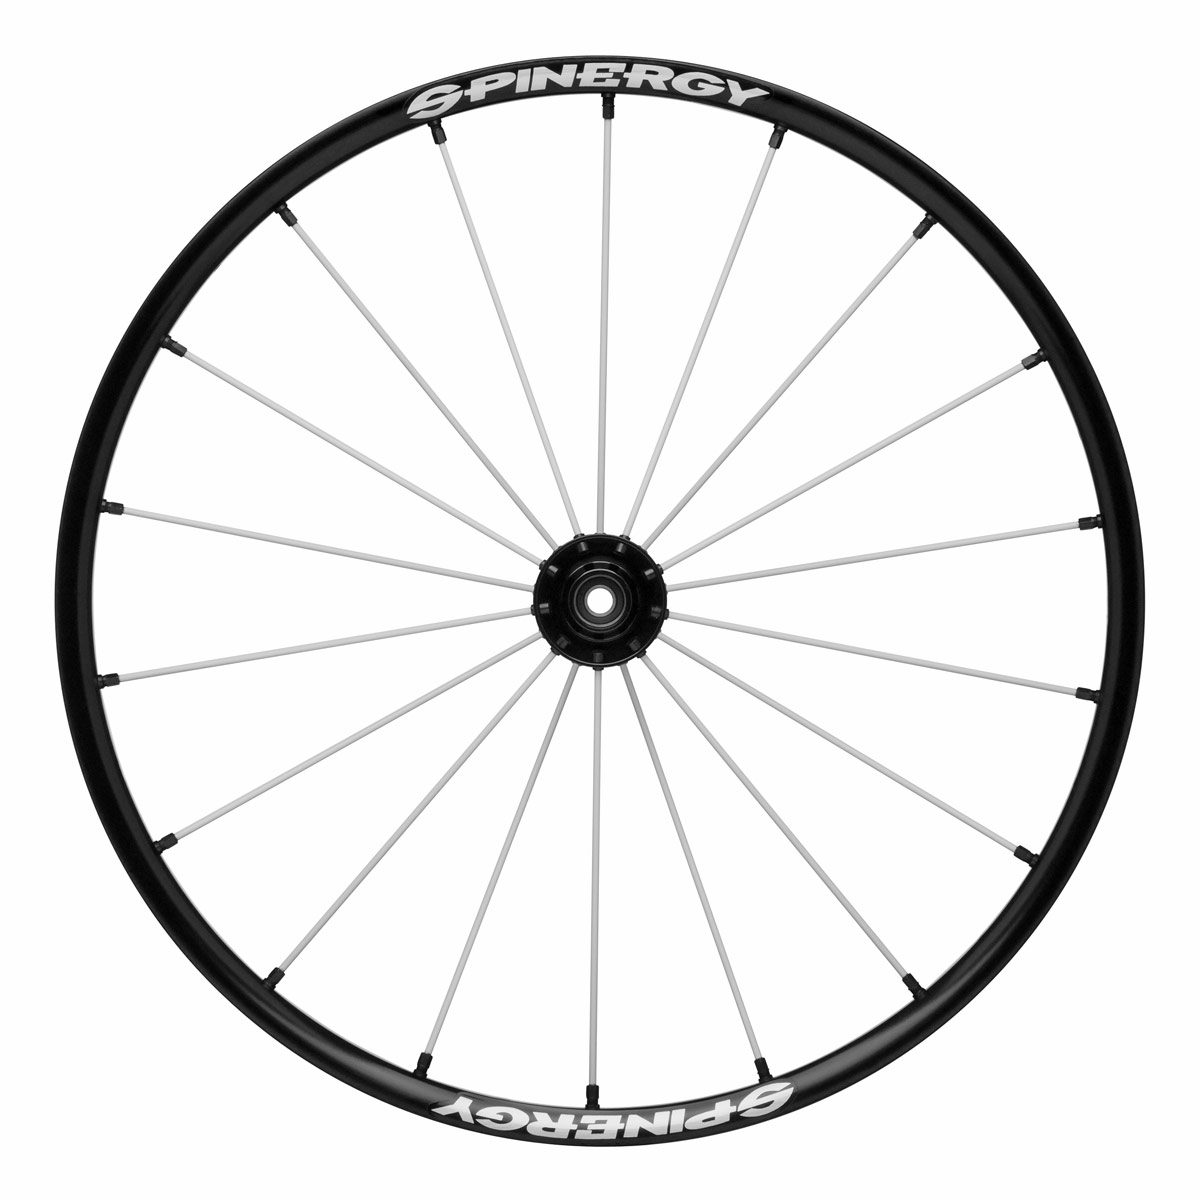 Spinergy Sport Lite Extreme SLX 18 Spoke Wheelchair Wheels